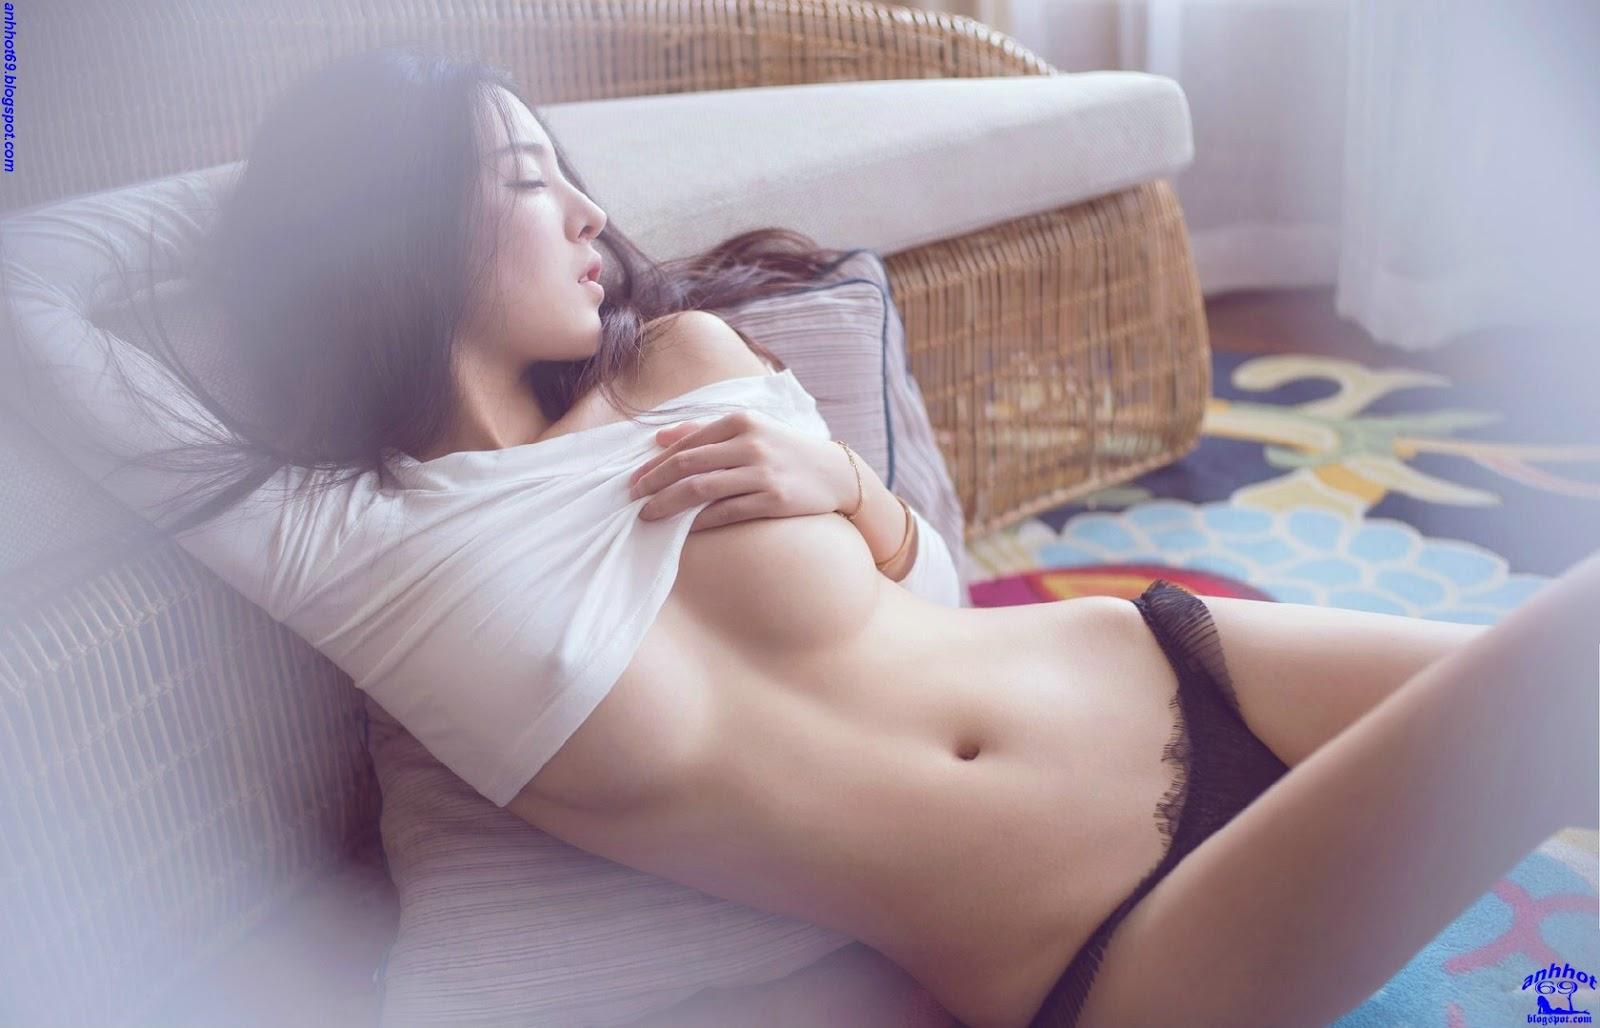 Chen_Darongl_150716_11